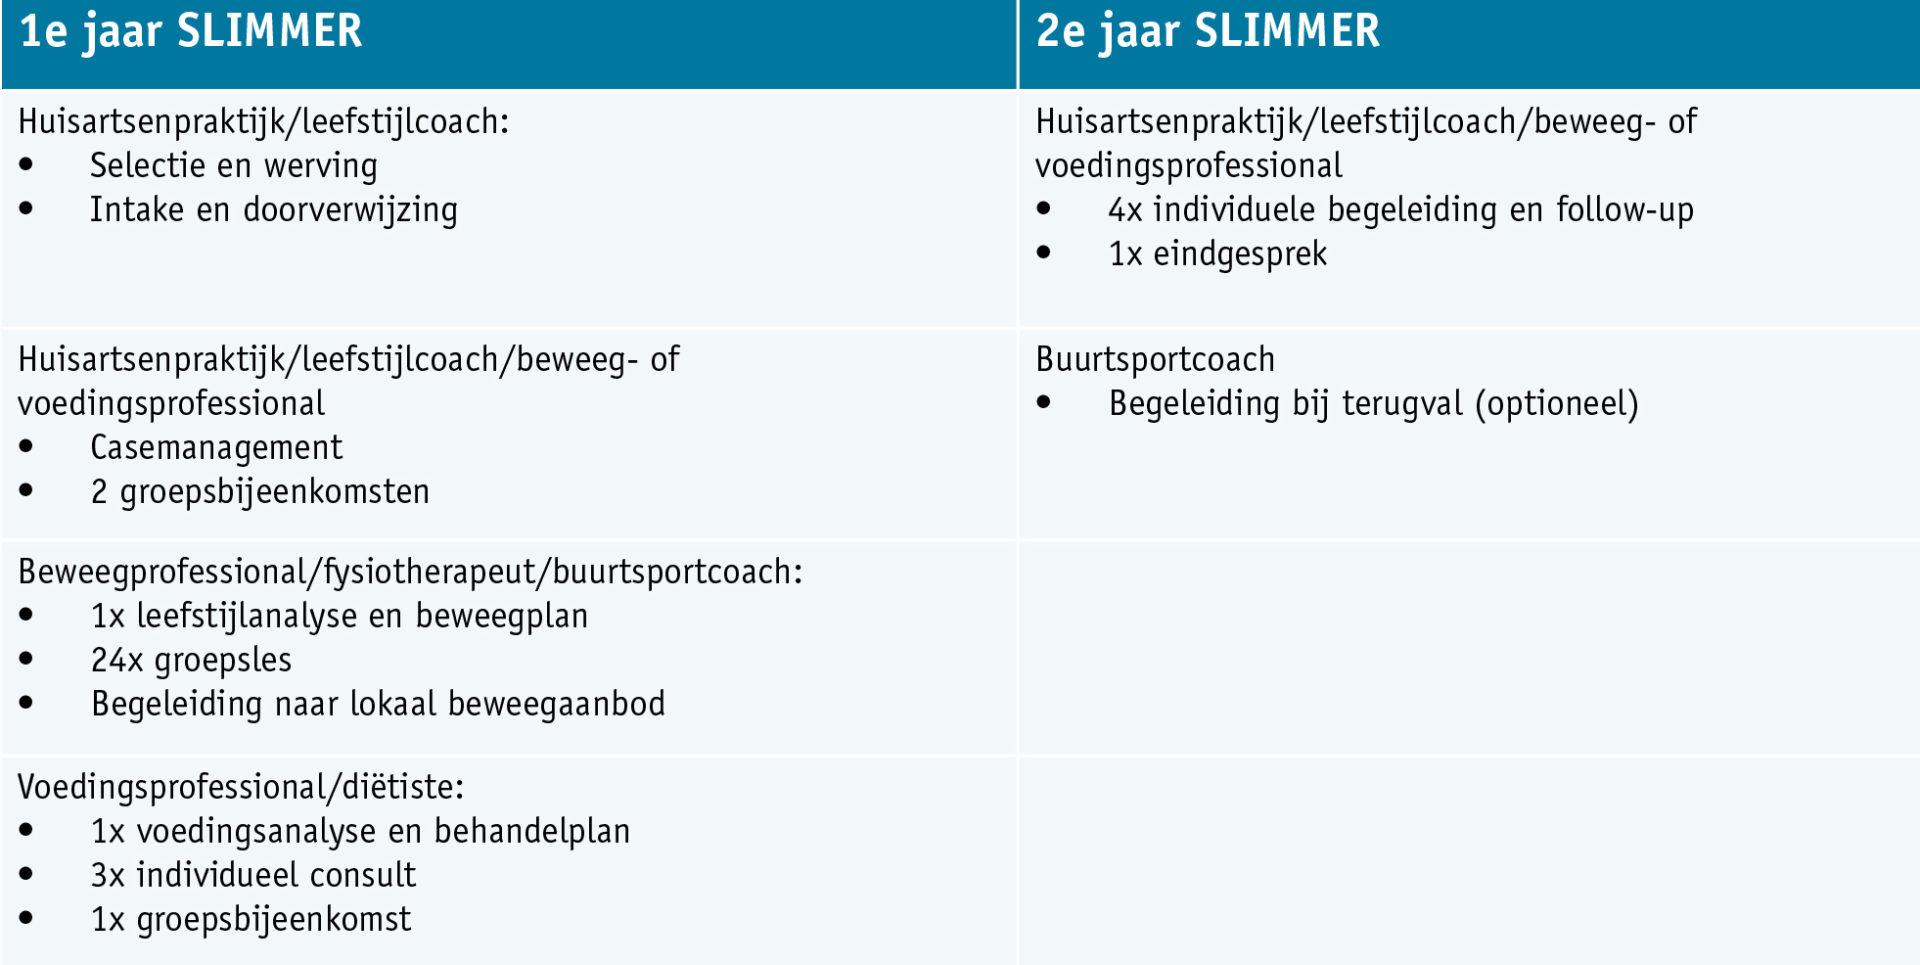 Inhoud programma Slimmer2